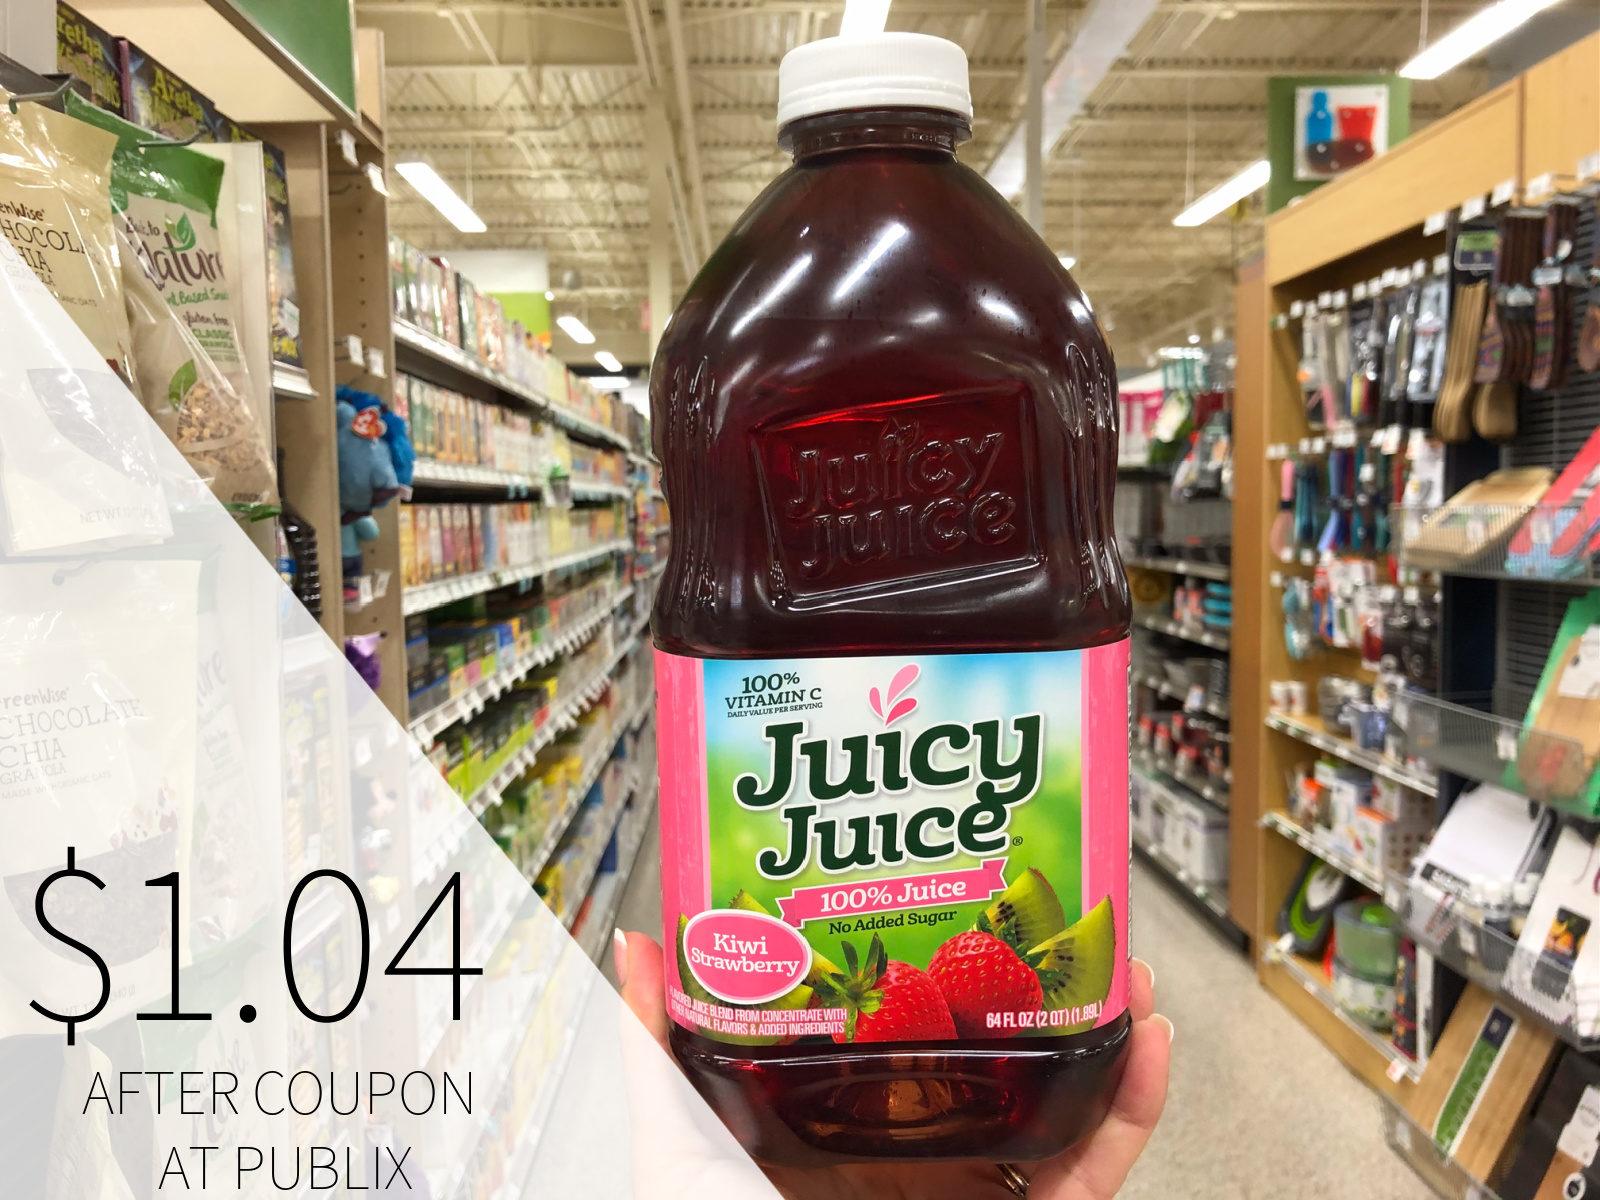 Juicy Juice As Low As 79¢ At Publix on I Heart Publix 1